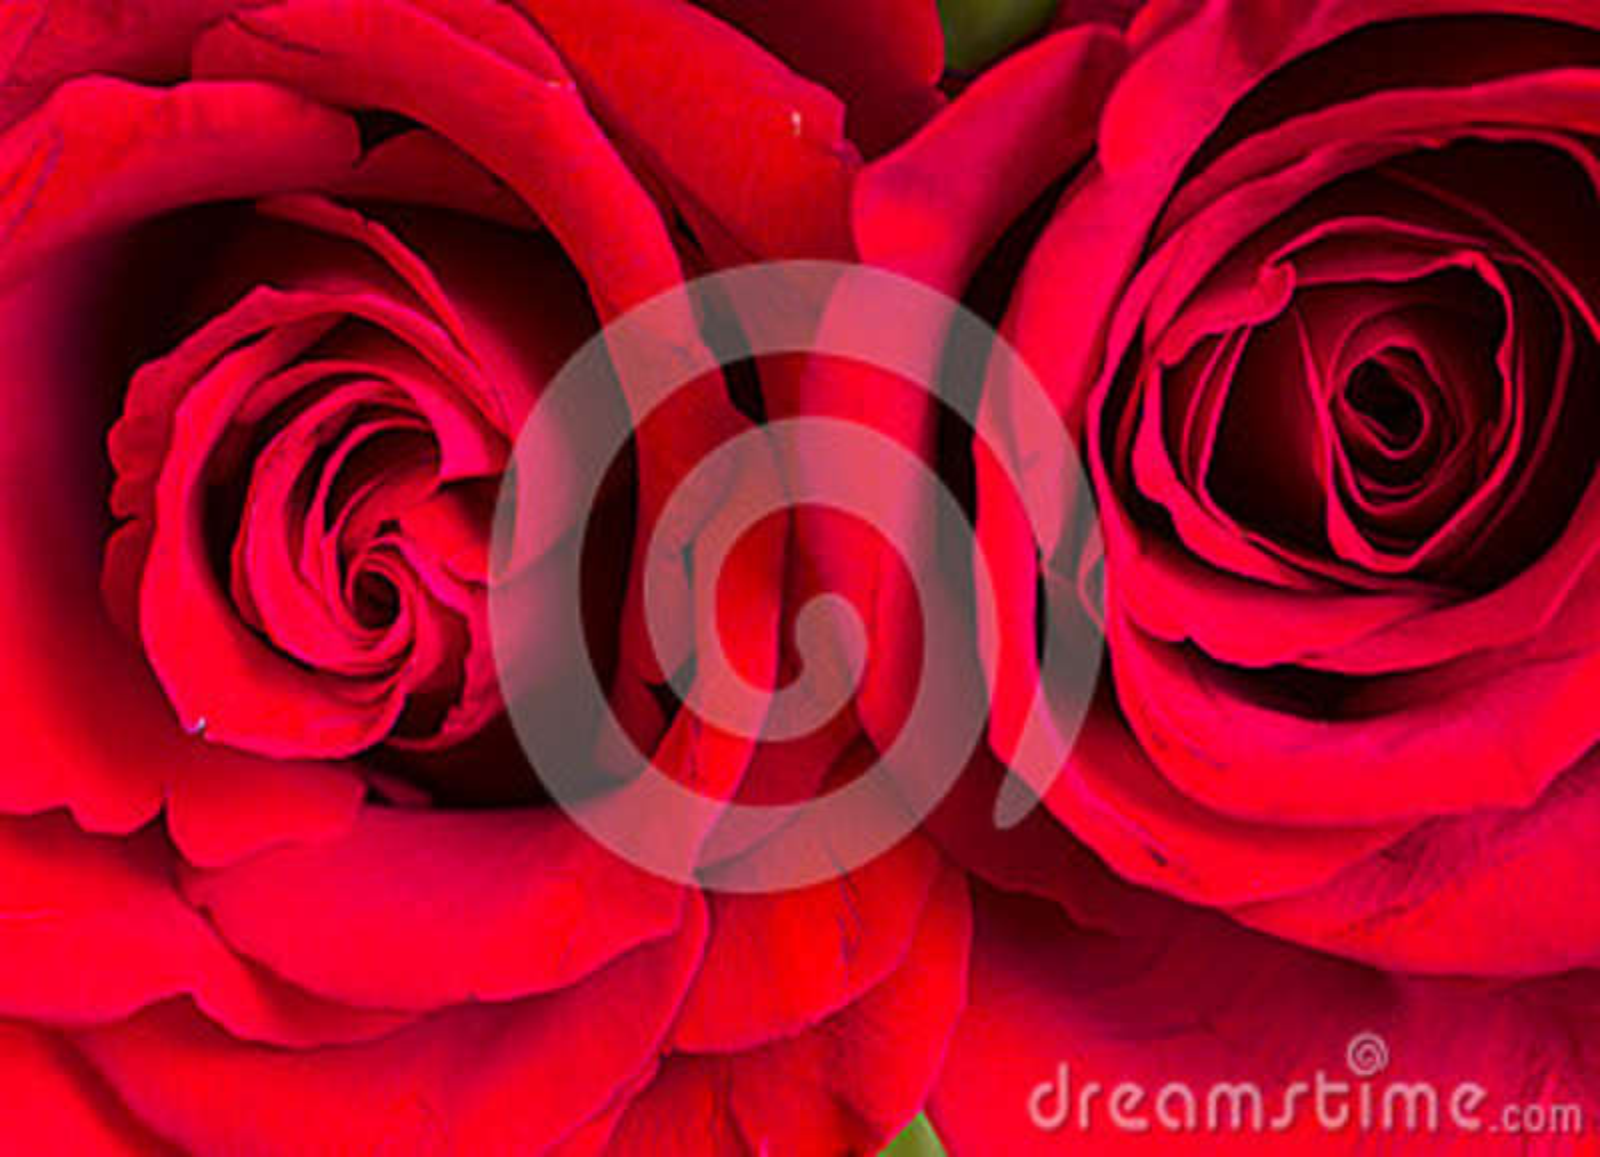 Download Rosas vermelhas foto de stock. Imagem de híbrido, bouquet - 29234982